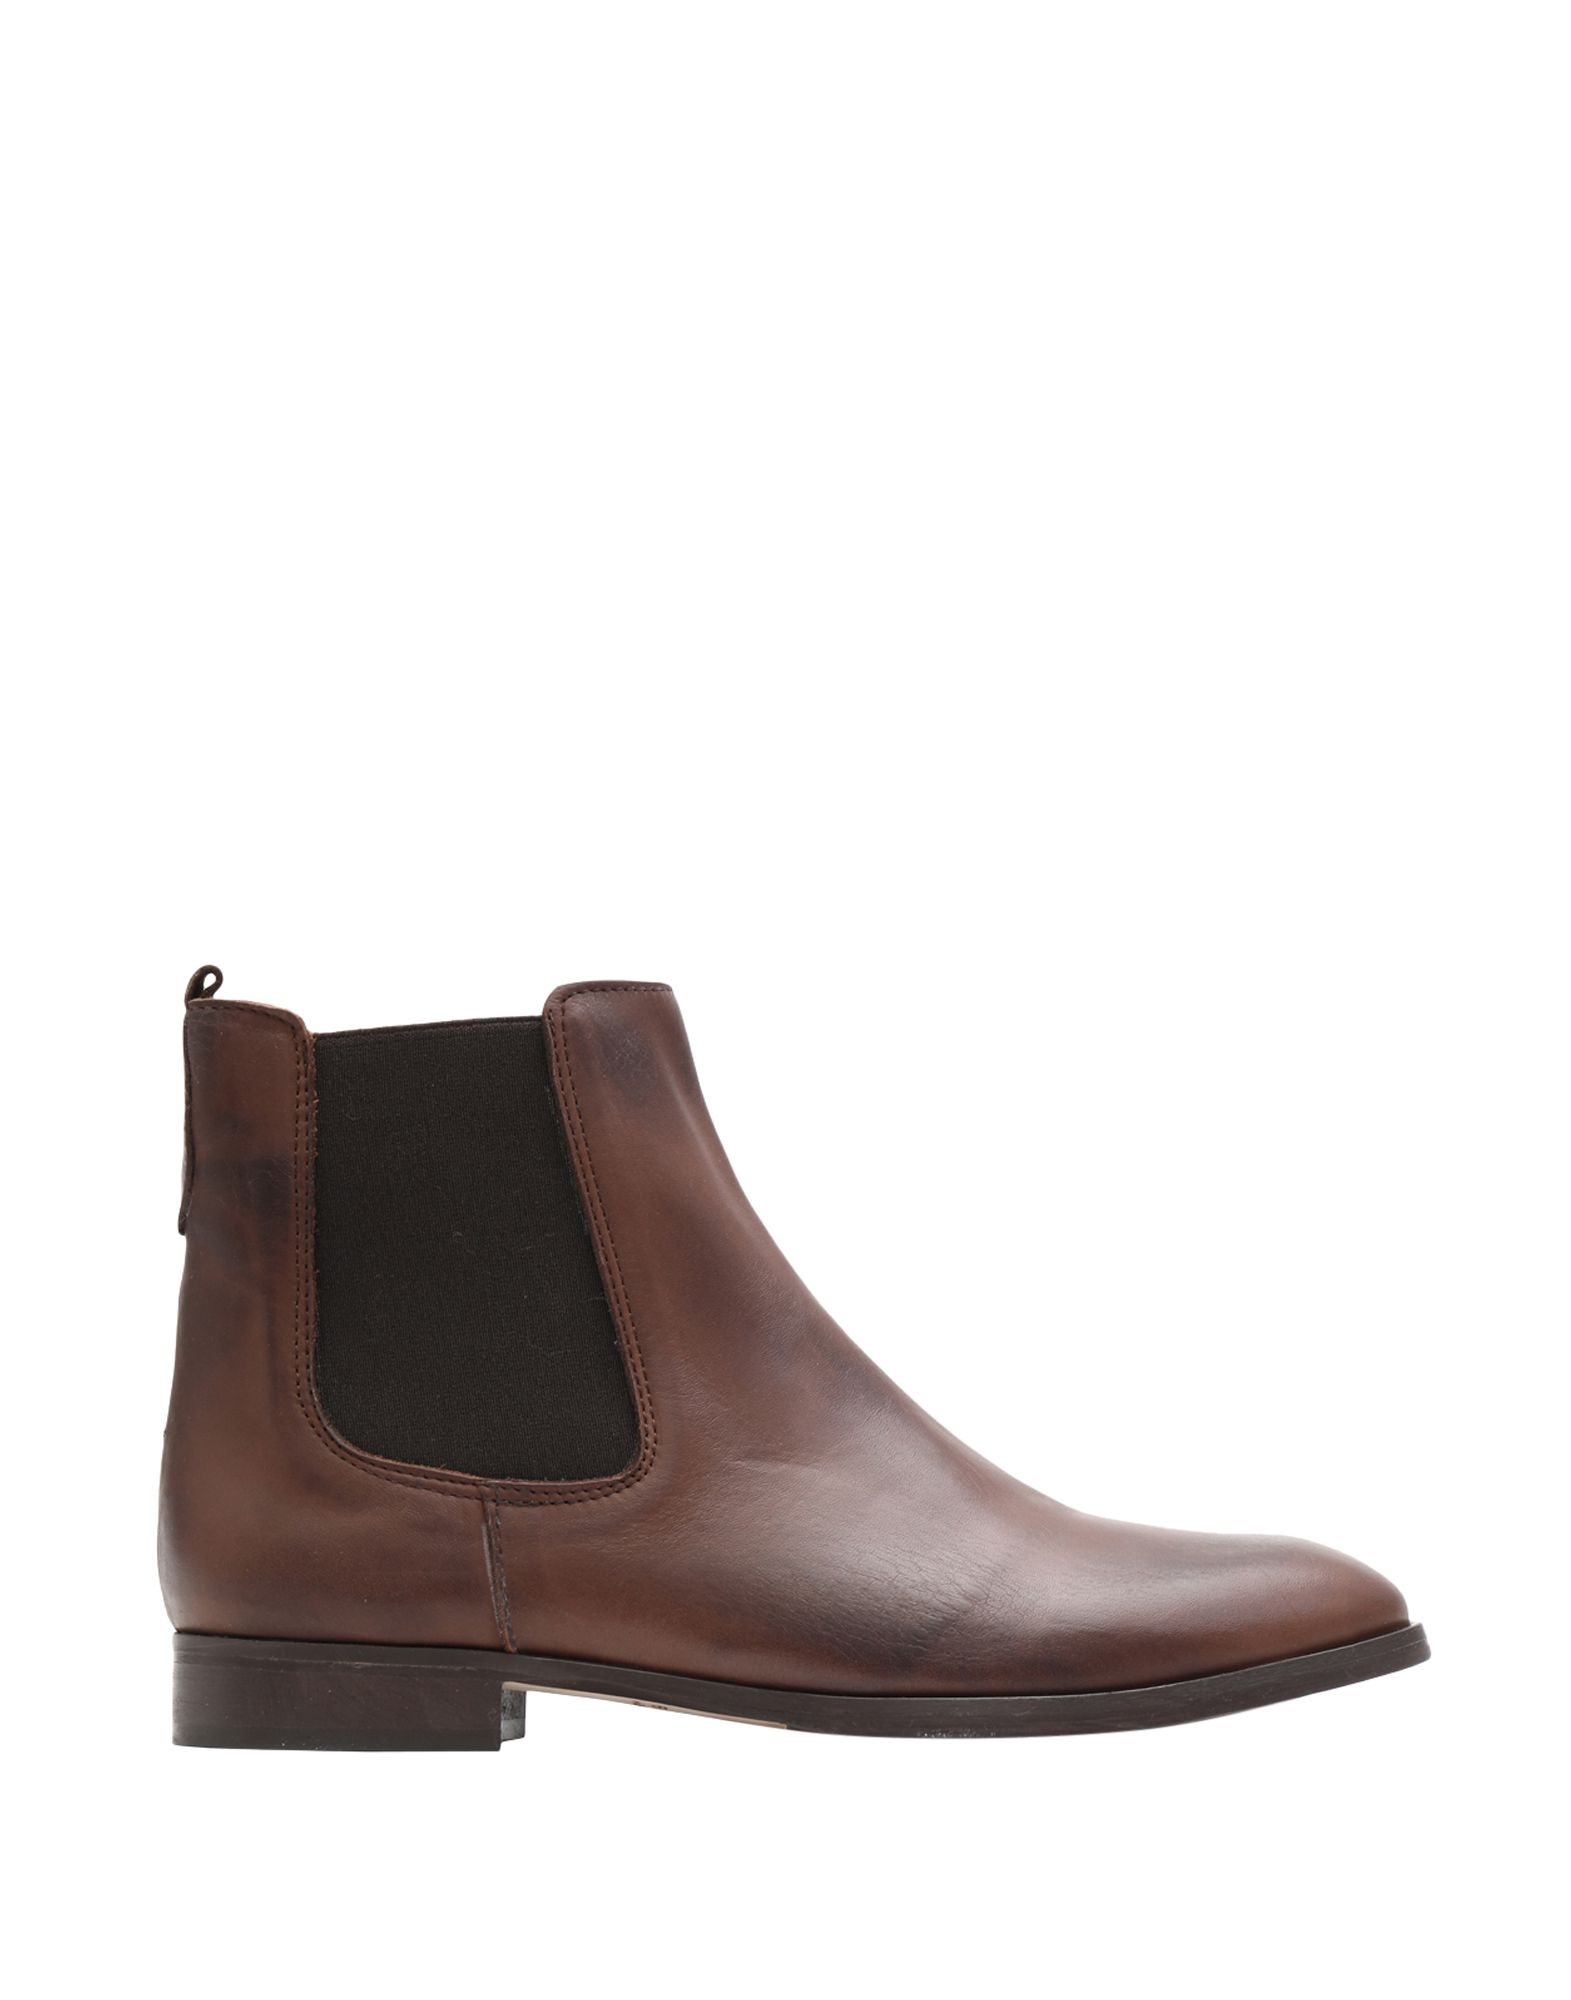 8 by YOOX Полусапоги и высокие ботинки h by hudson полусапоги и высокие ботинки